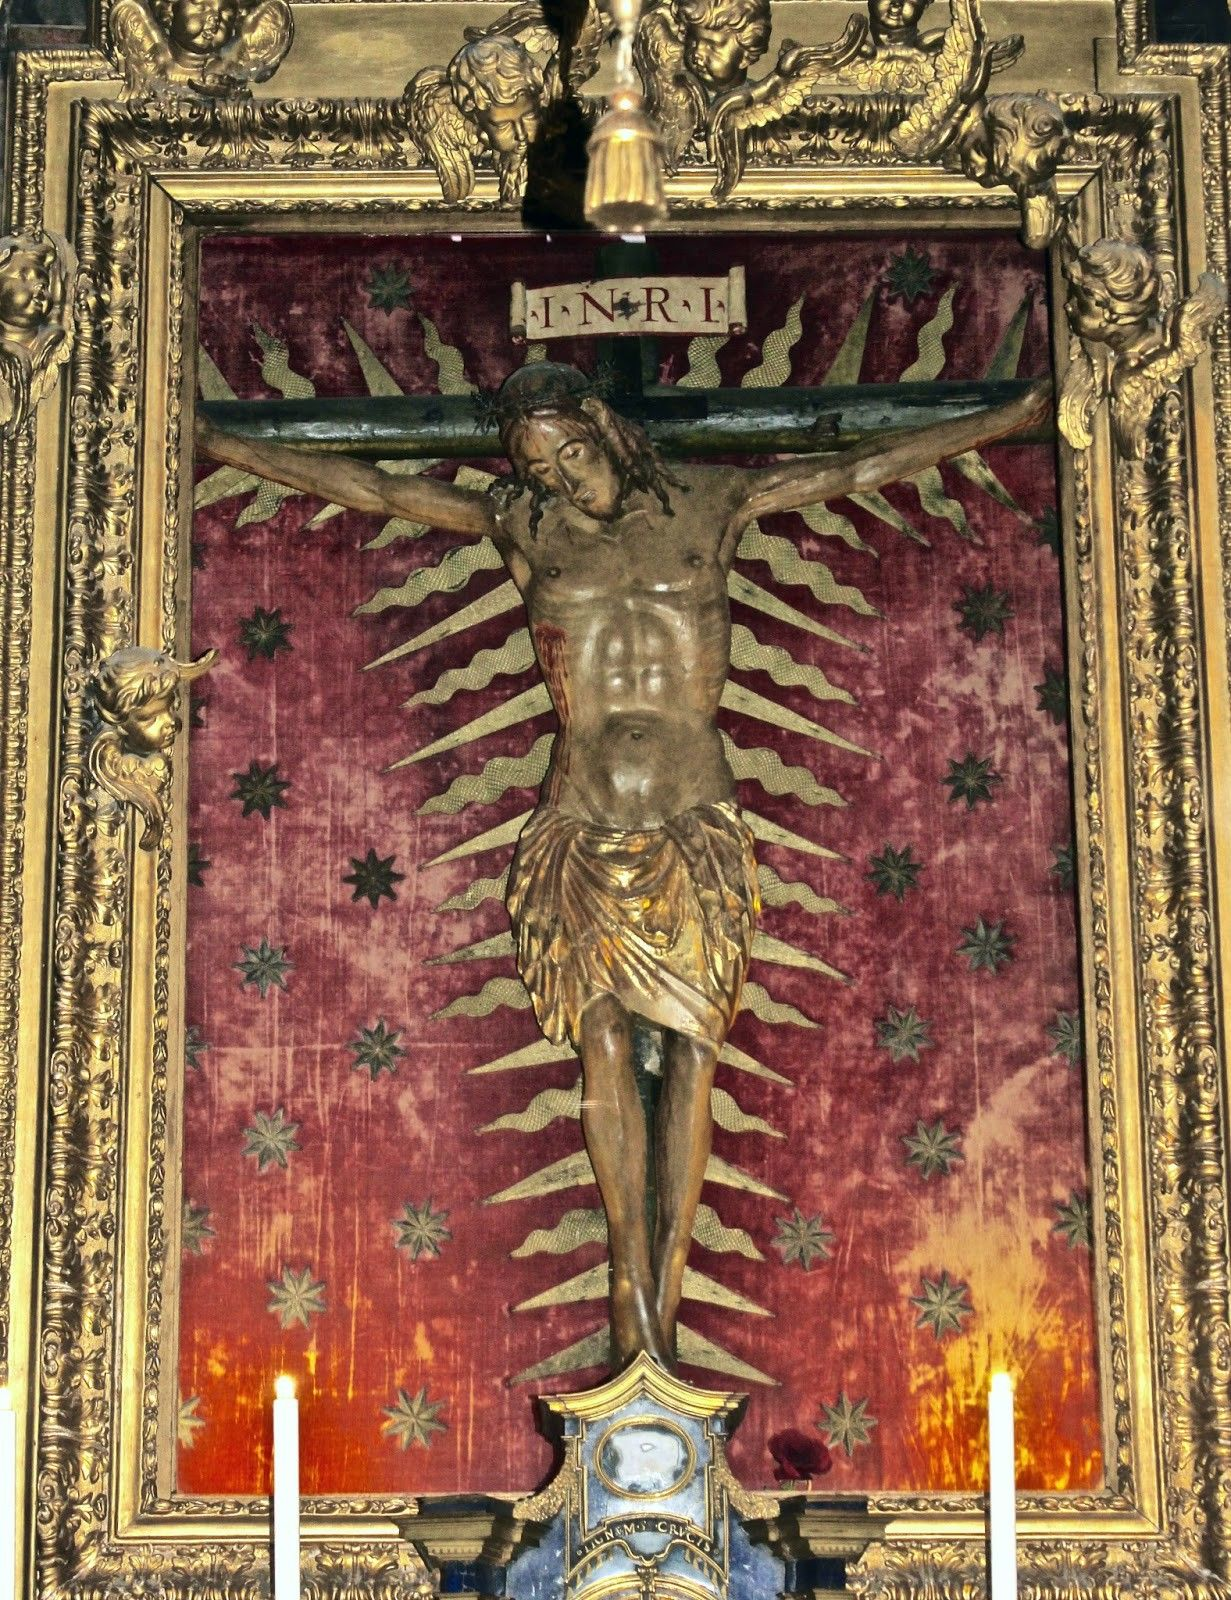 Artista romano, Crocifisso di San Marcello al Corso (1370-1379 circa; legno policromo; Roma, San Marcello al Corso)